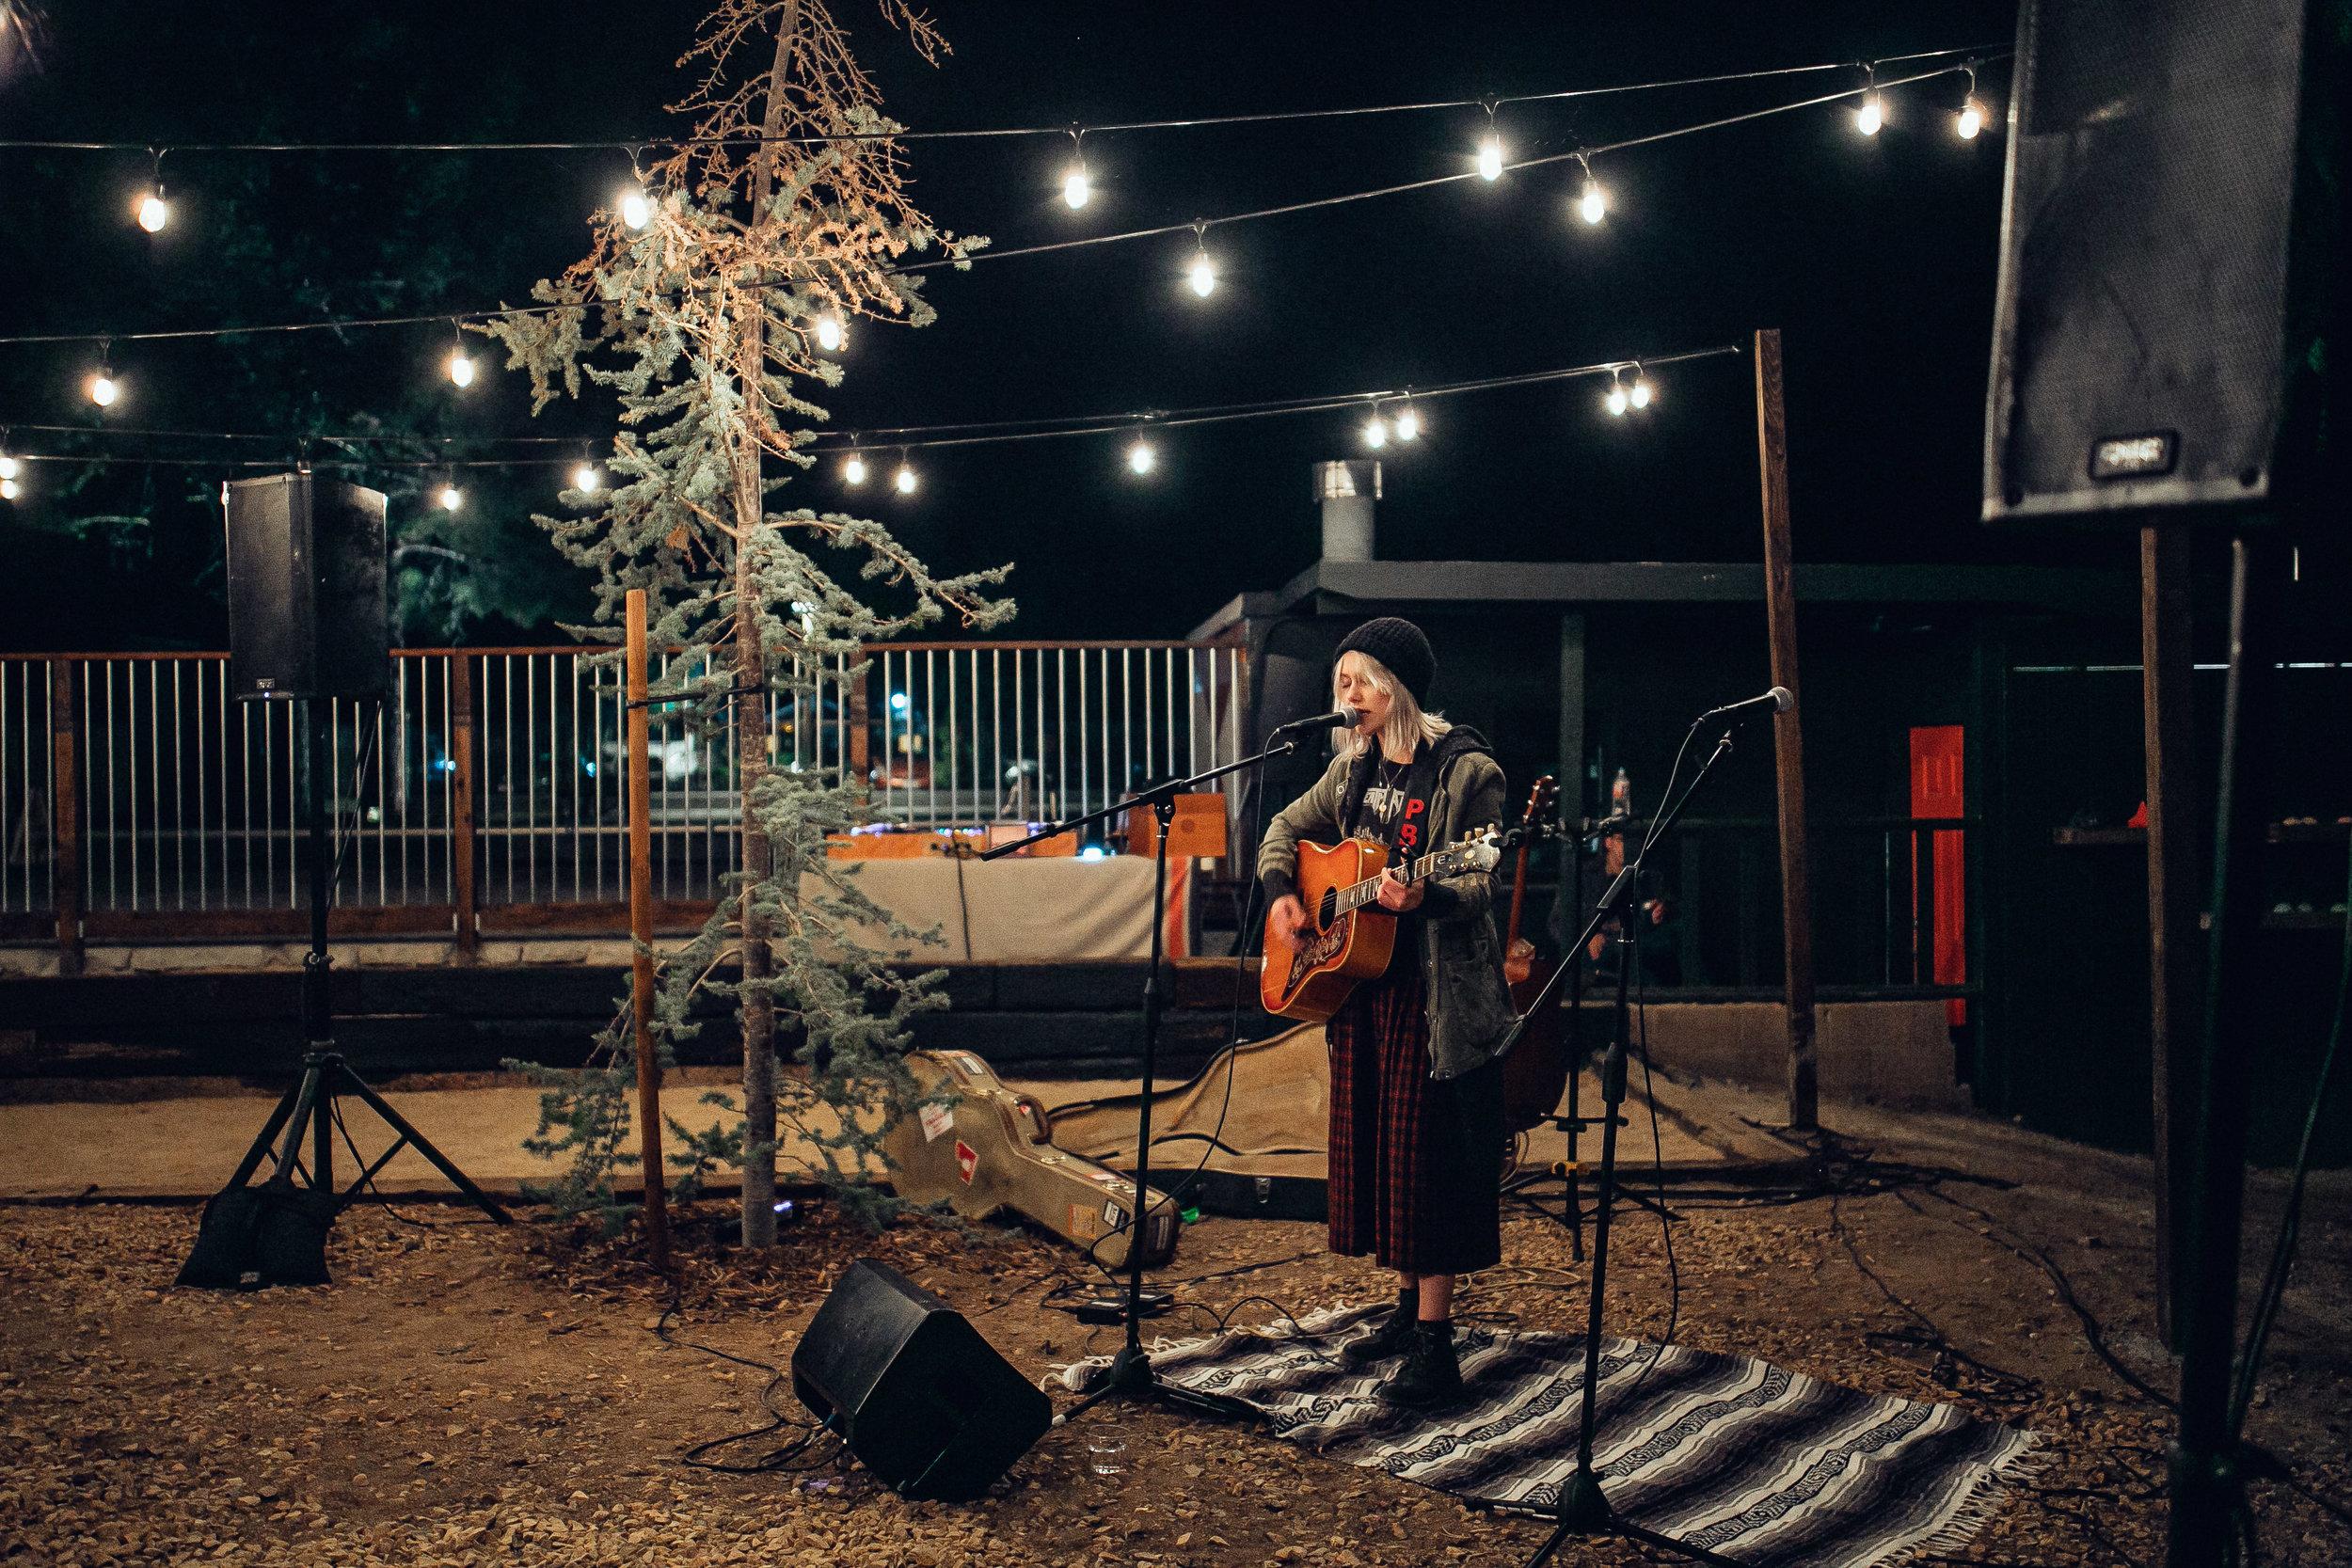 Phoebe Bridgers  serenading us under the meadow lights.